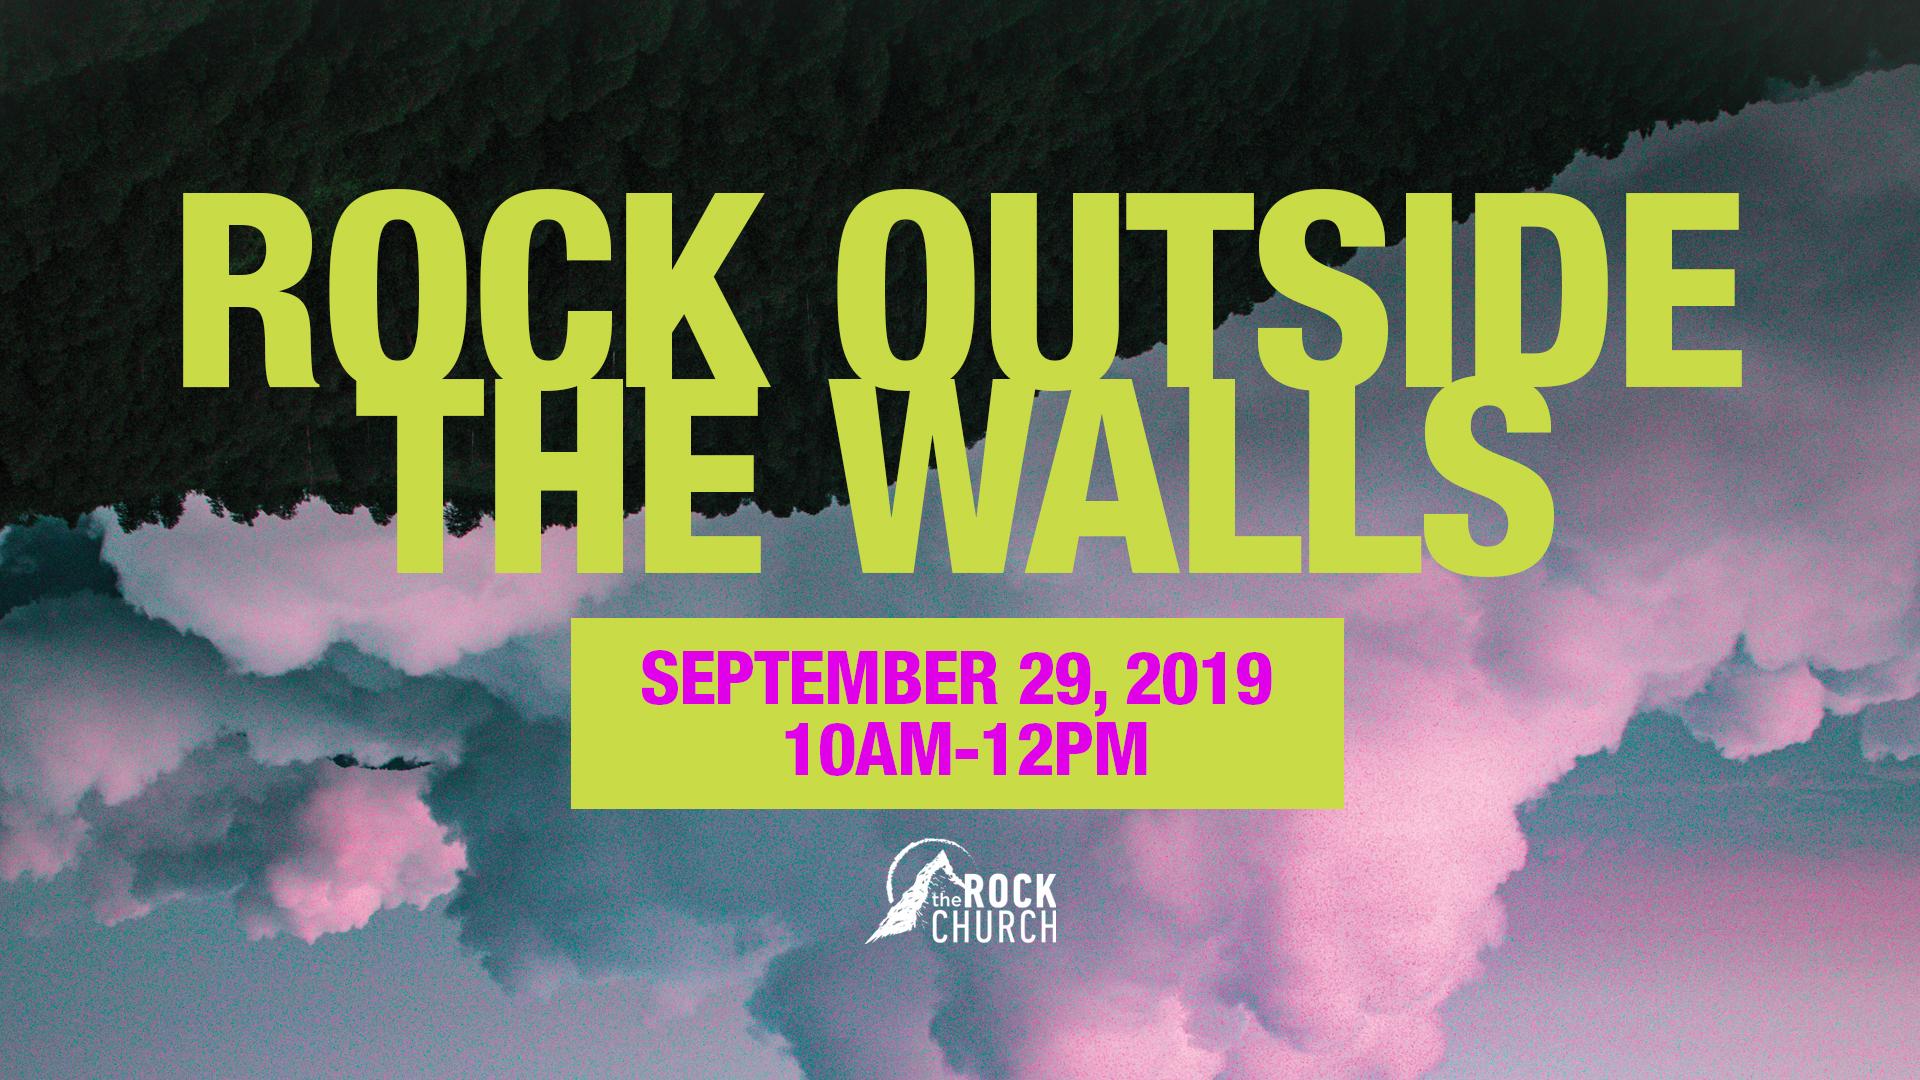 Rock outside the walls promo.jpg